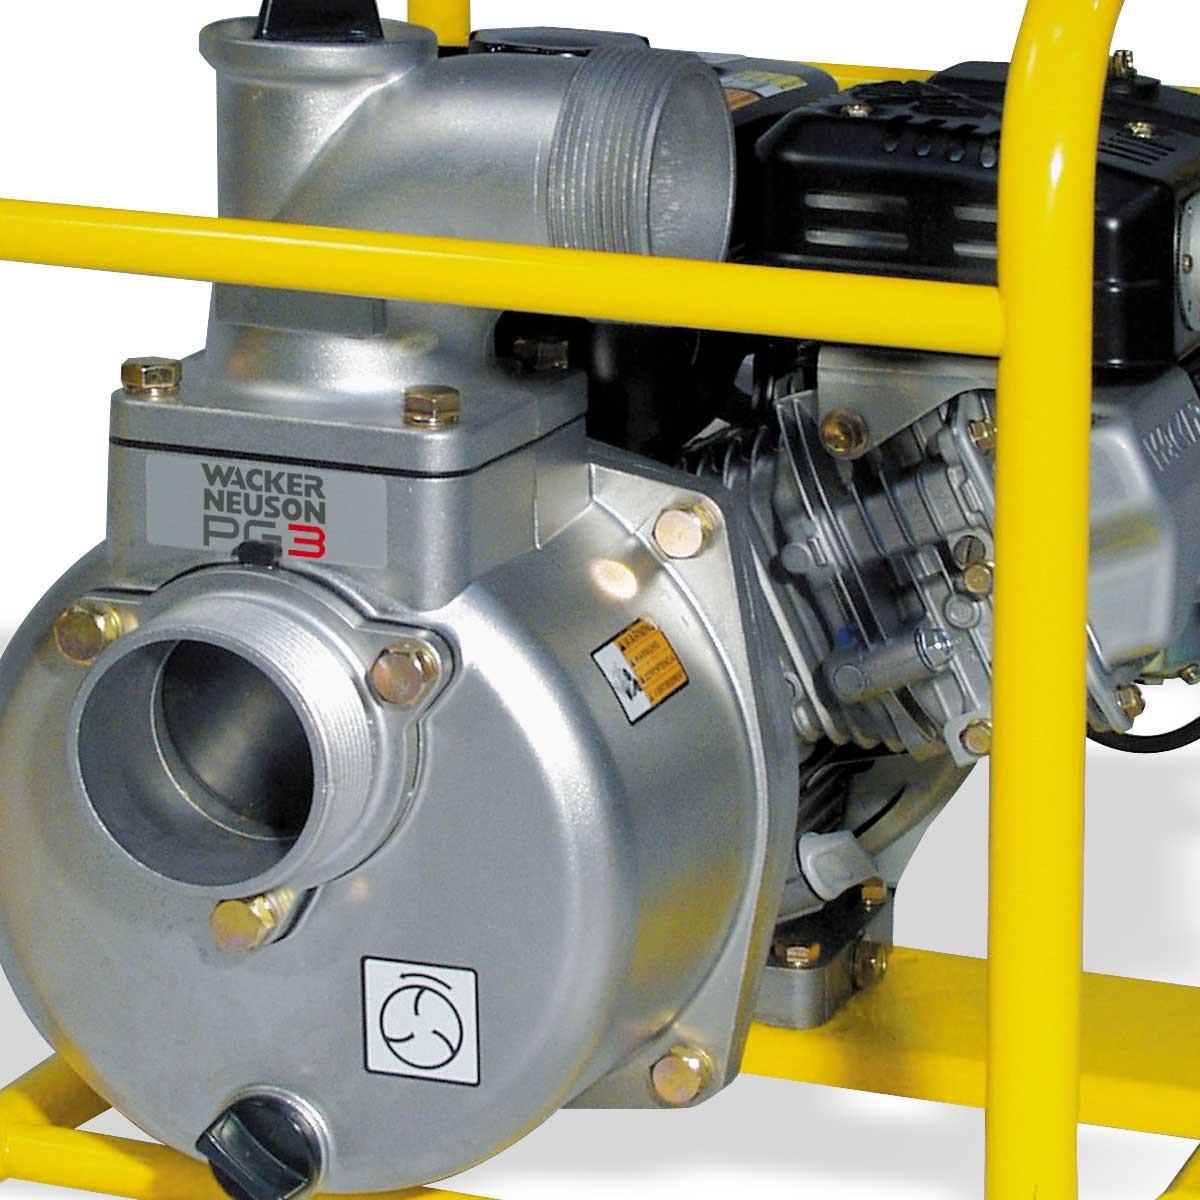 3 inch Wacker Neuson Centrifugal Dewatering Pump